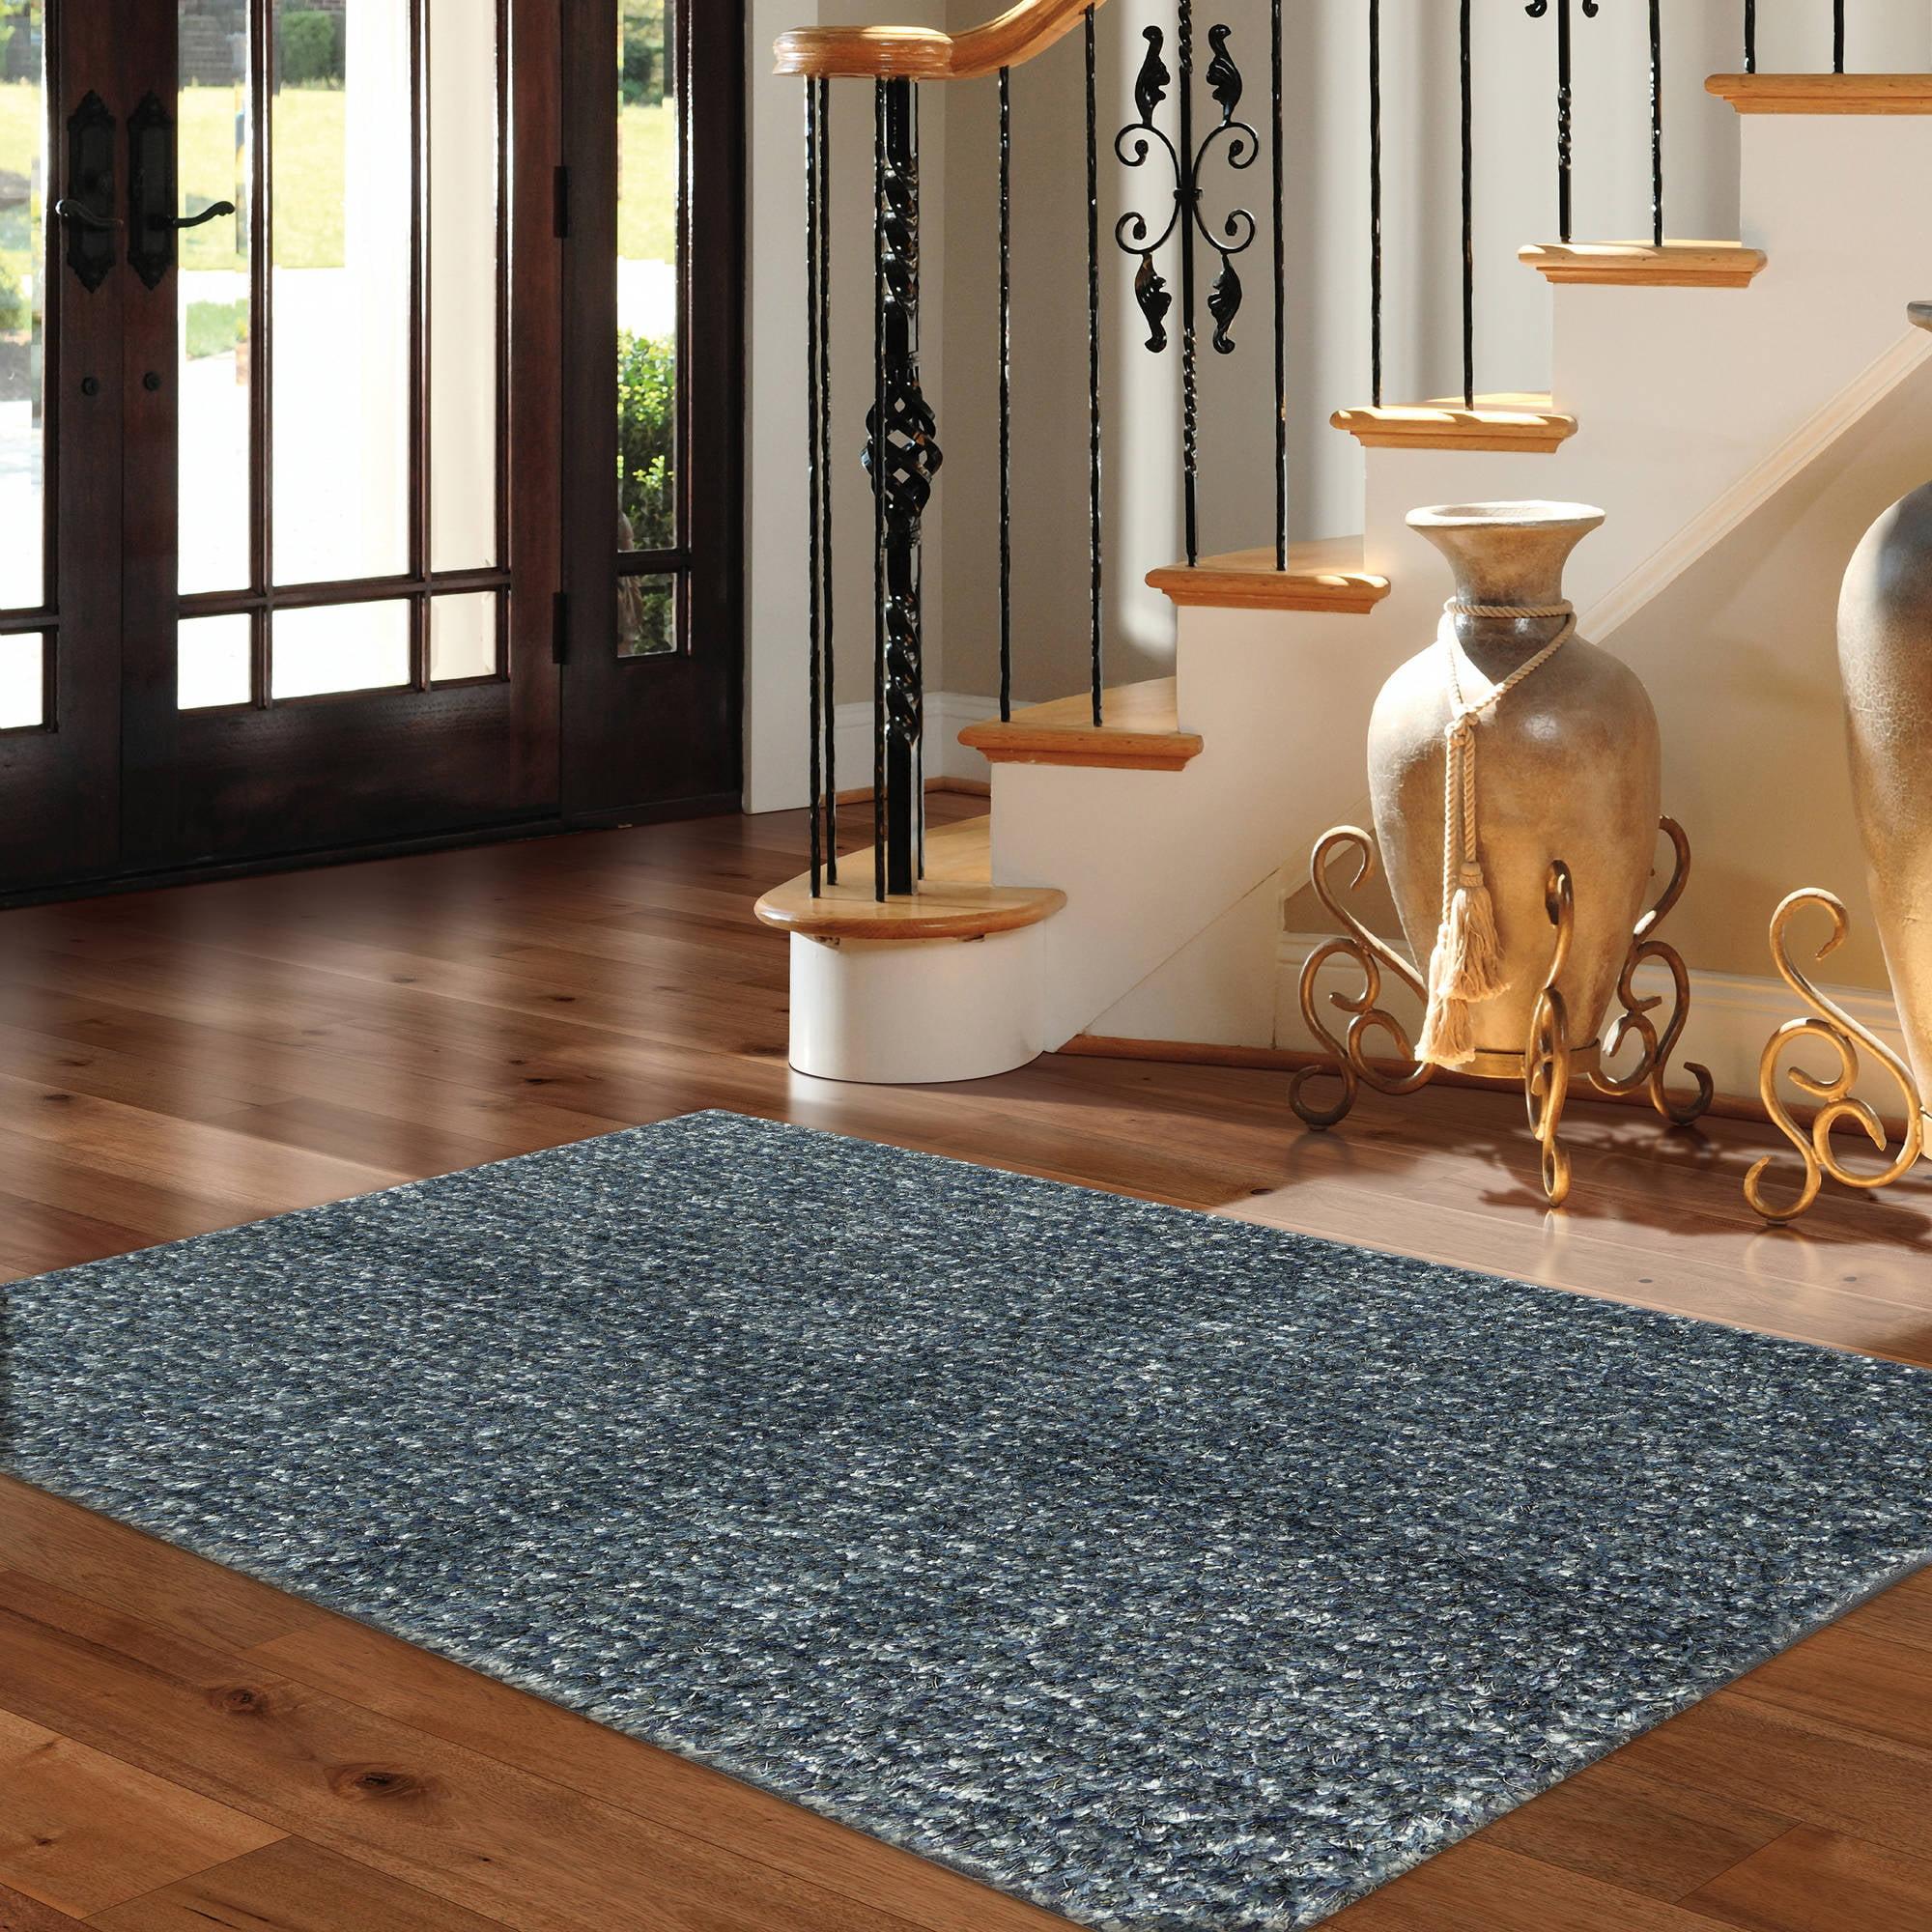 Mohawk Home Eyelash Blue Solid Shag Area Rug Walmart Com